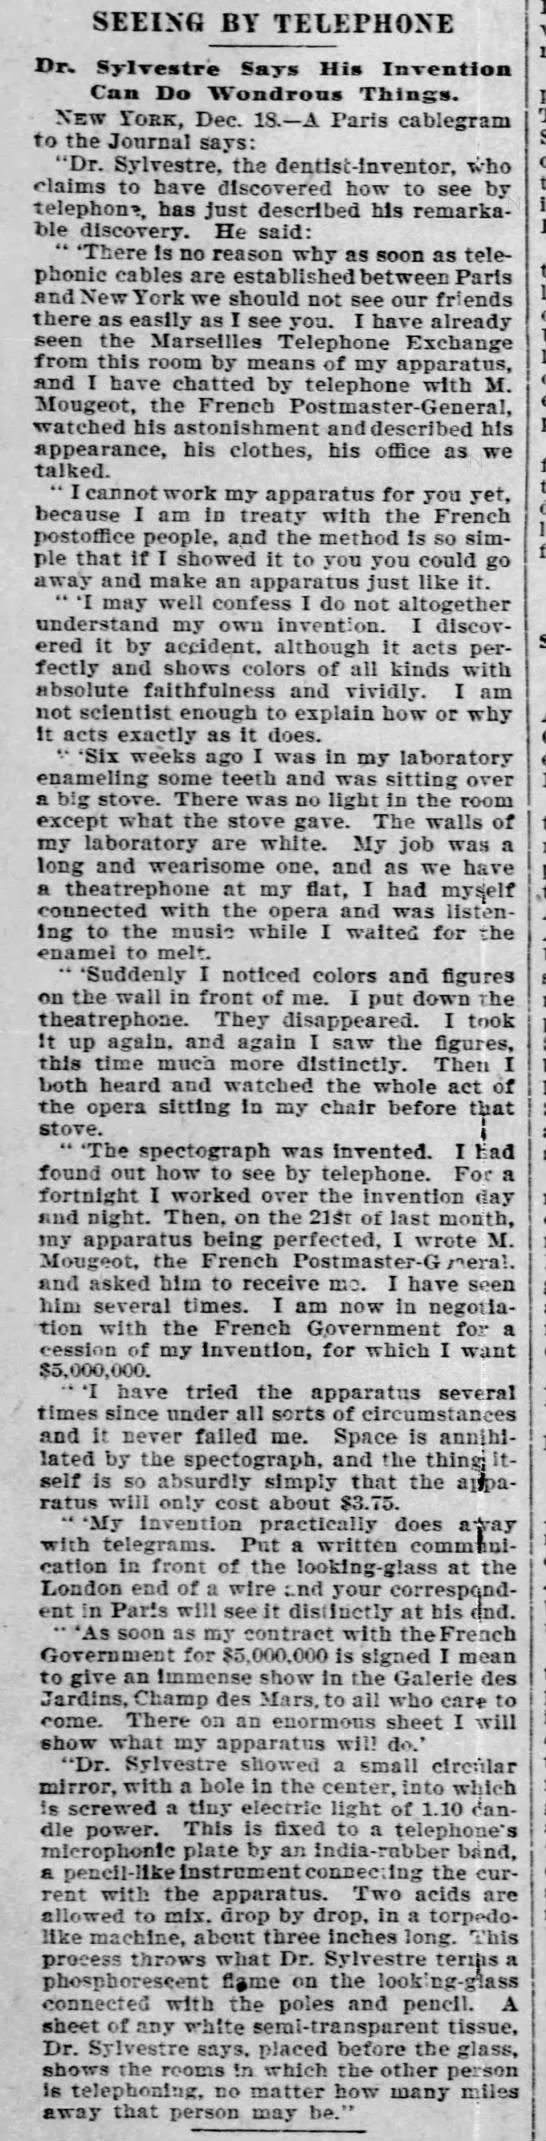 Baltimore Sun 19 December 1901.jpg